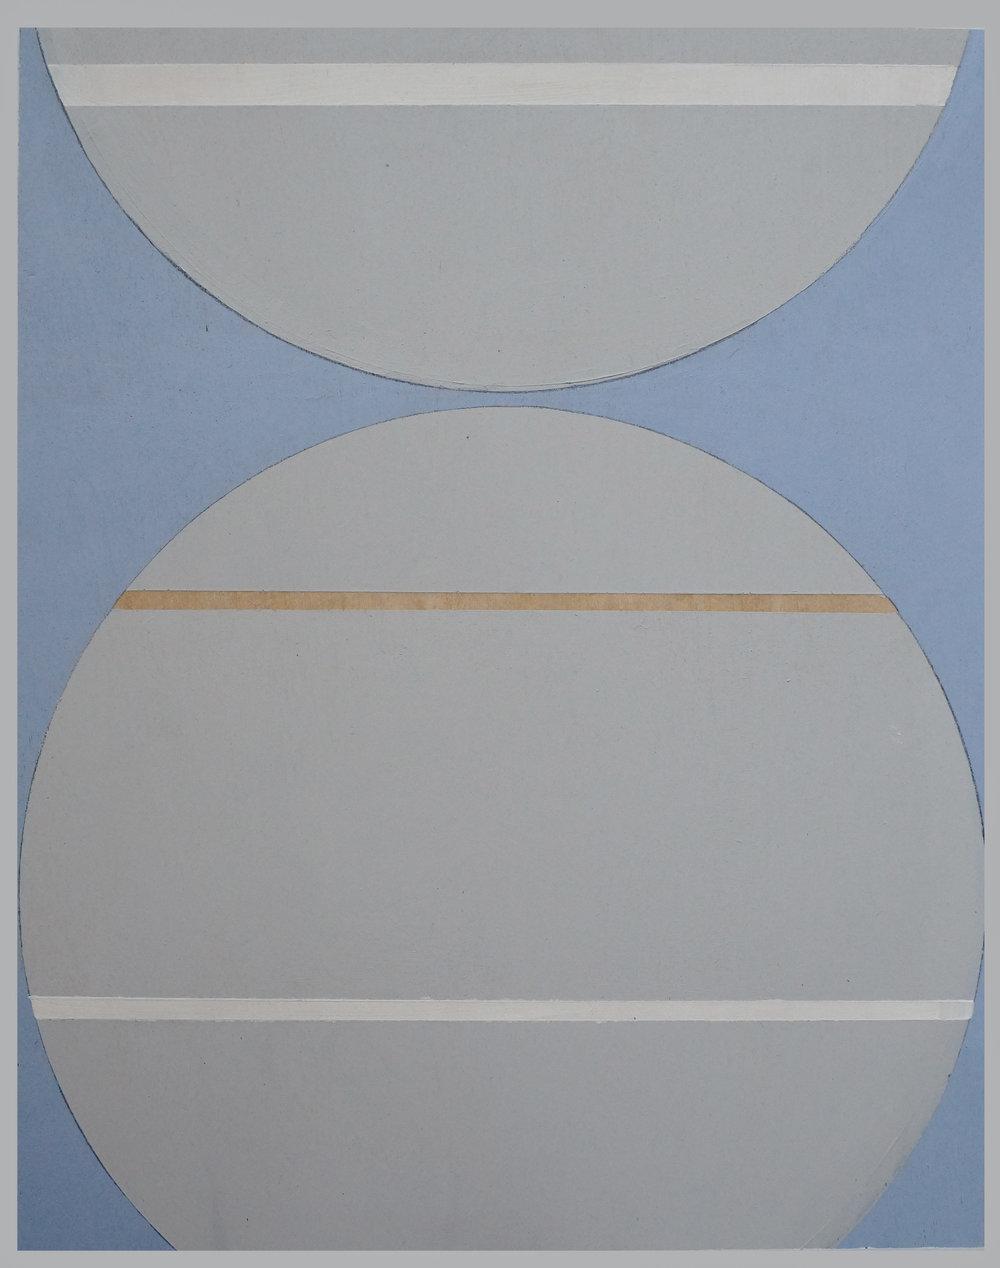 Jaclyn Mottola- _Owl Post Again_- 10 x 8_ - Acrylic on Wood Panel - 2018 - $150.jpg